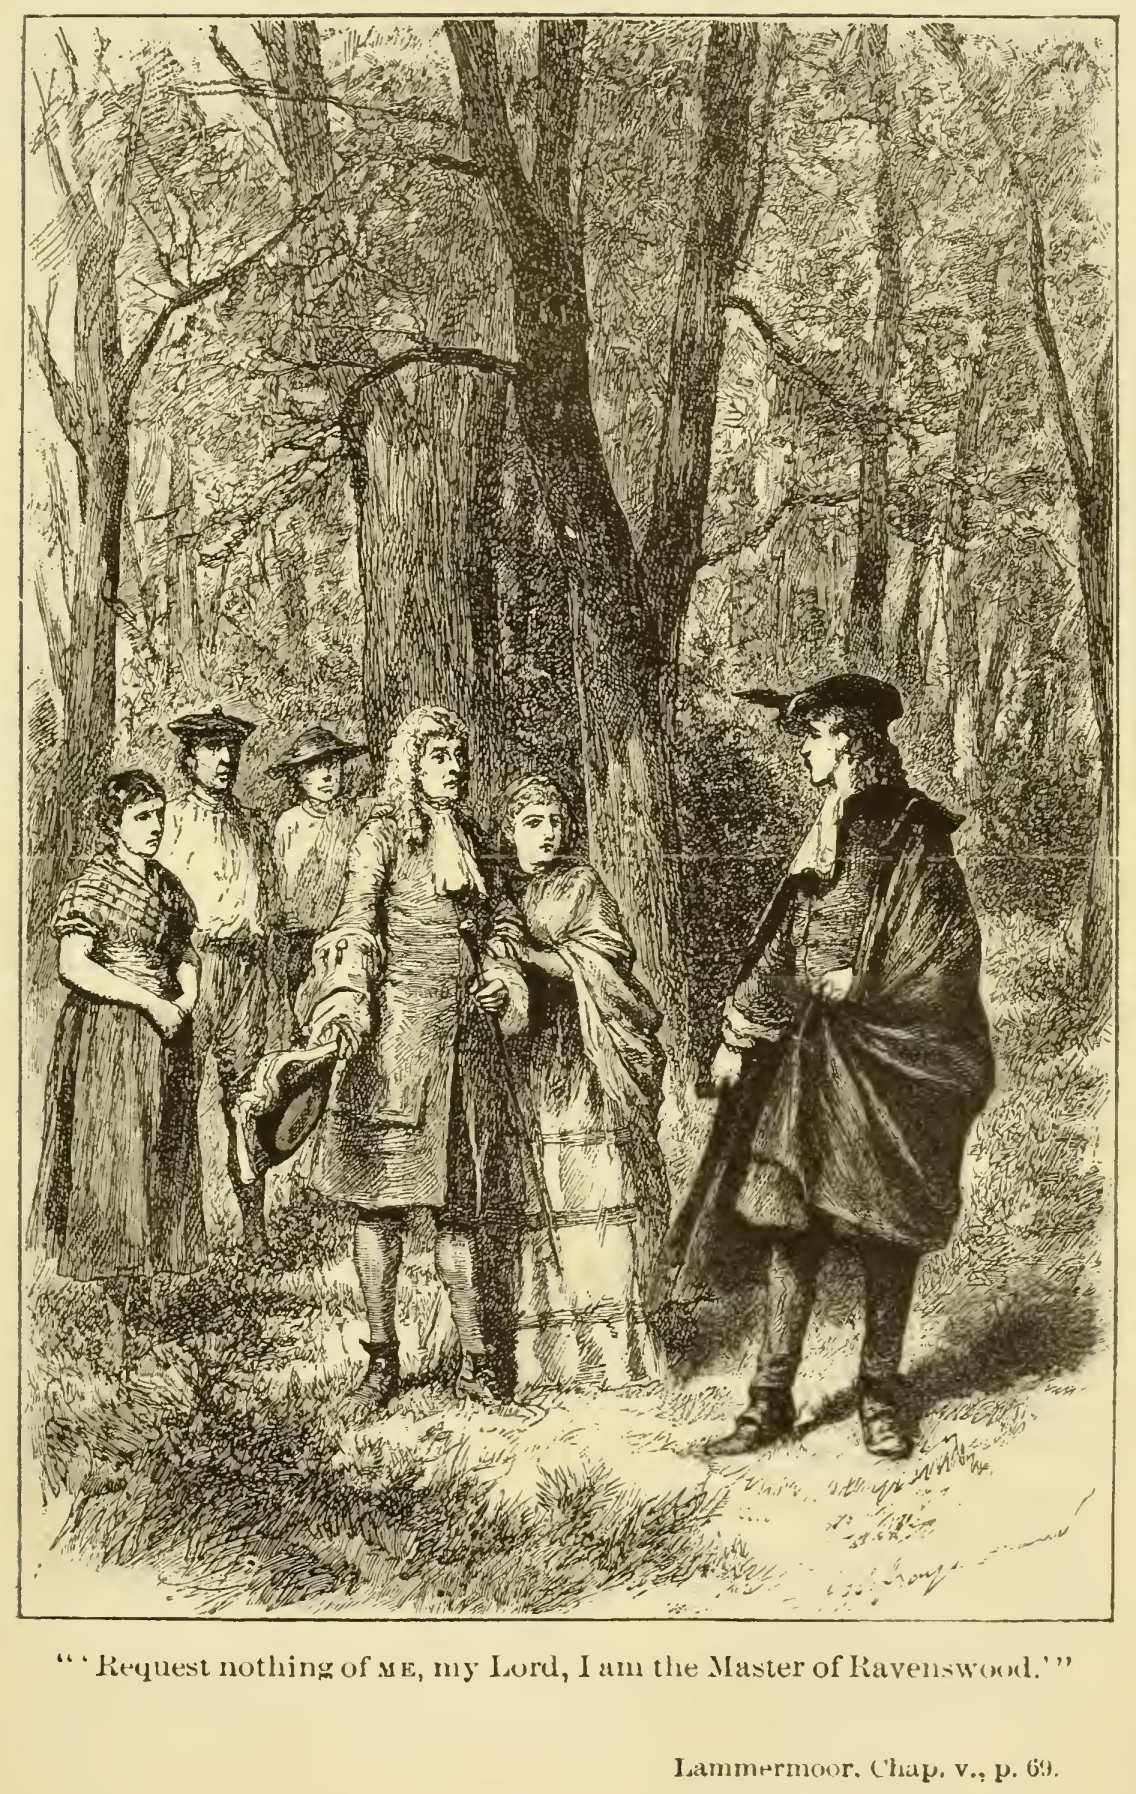 The Bride of Lammermoor, by Sir Walter Scott